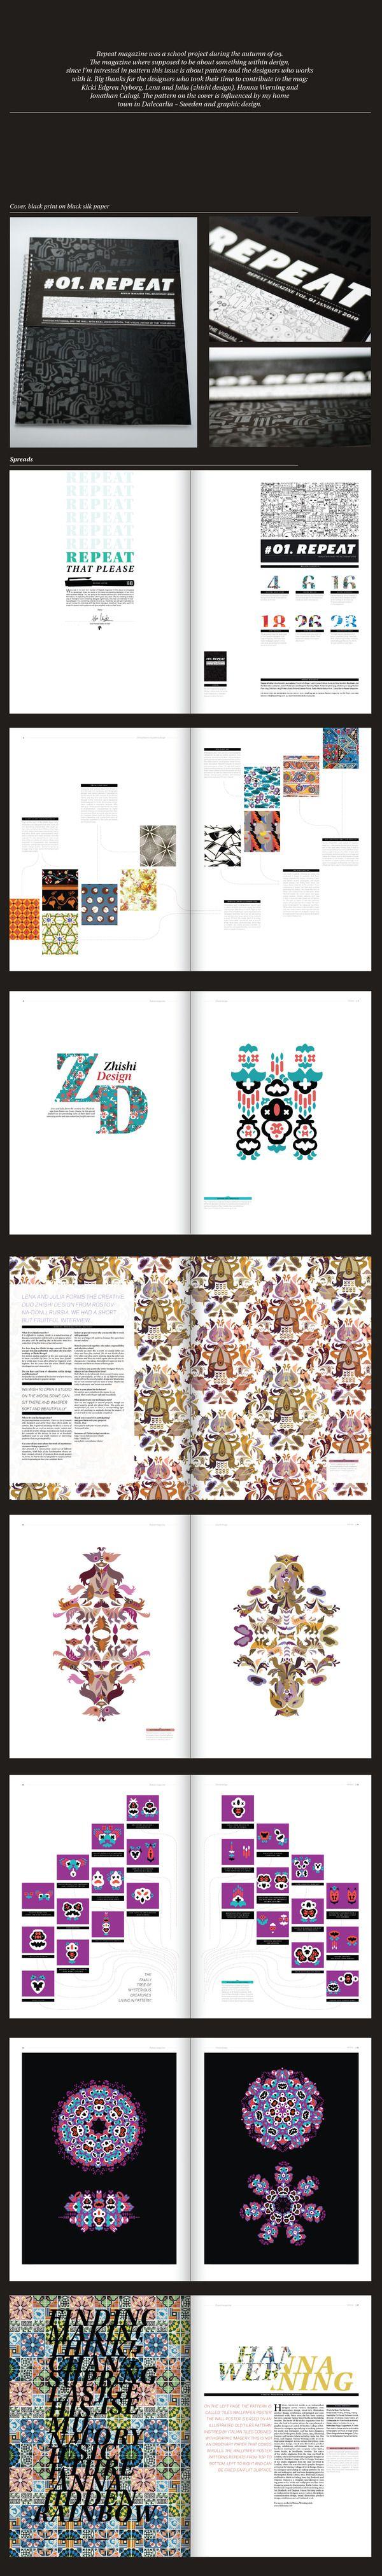 Repeat magazine by Moa Nordahl, via Behance